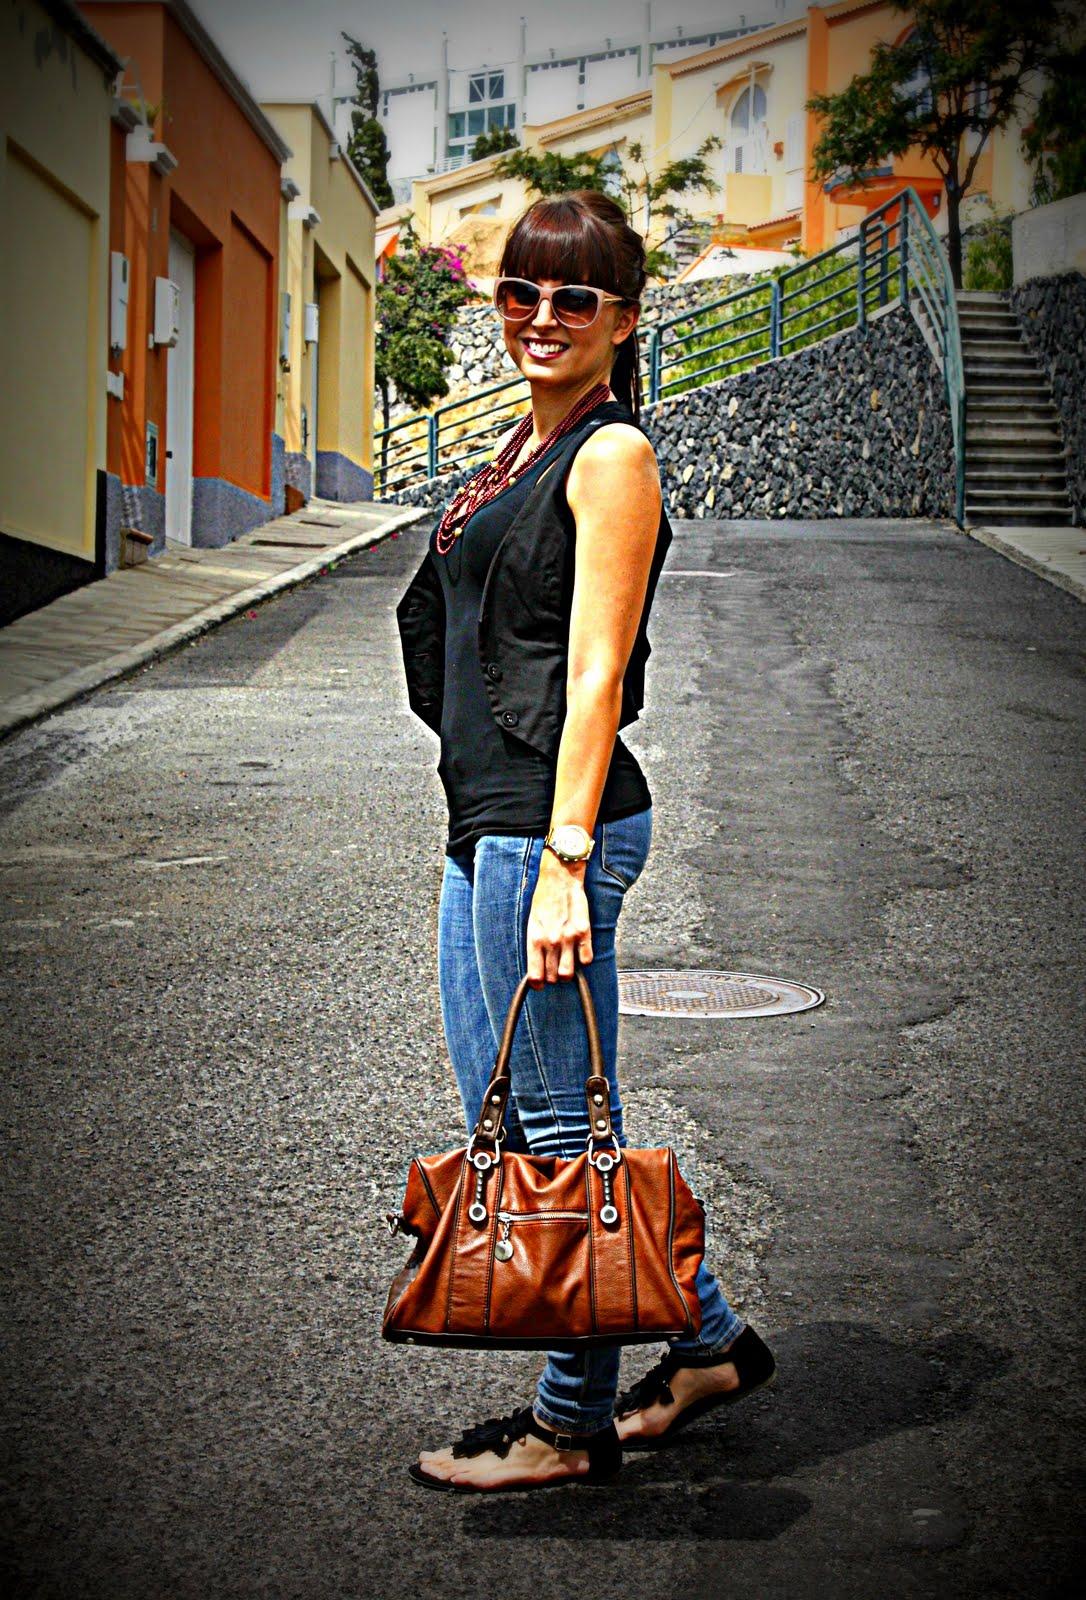 Collar y brazaletes de NATURA (V2011), tank top de BERSHKA (old), chaleco de STRADIVARIUS (old), jeans y sandalias de flecos de HM (V2011), bolso de TROEN